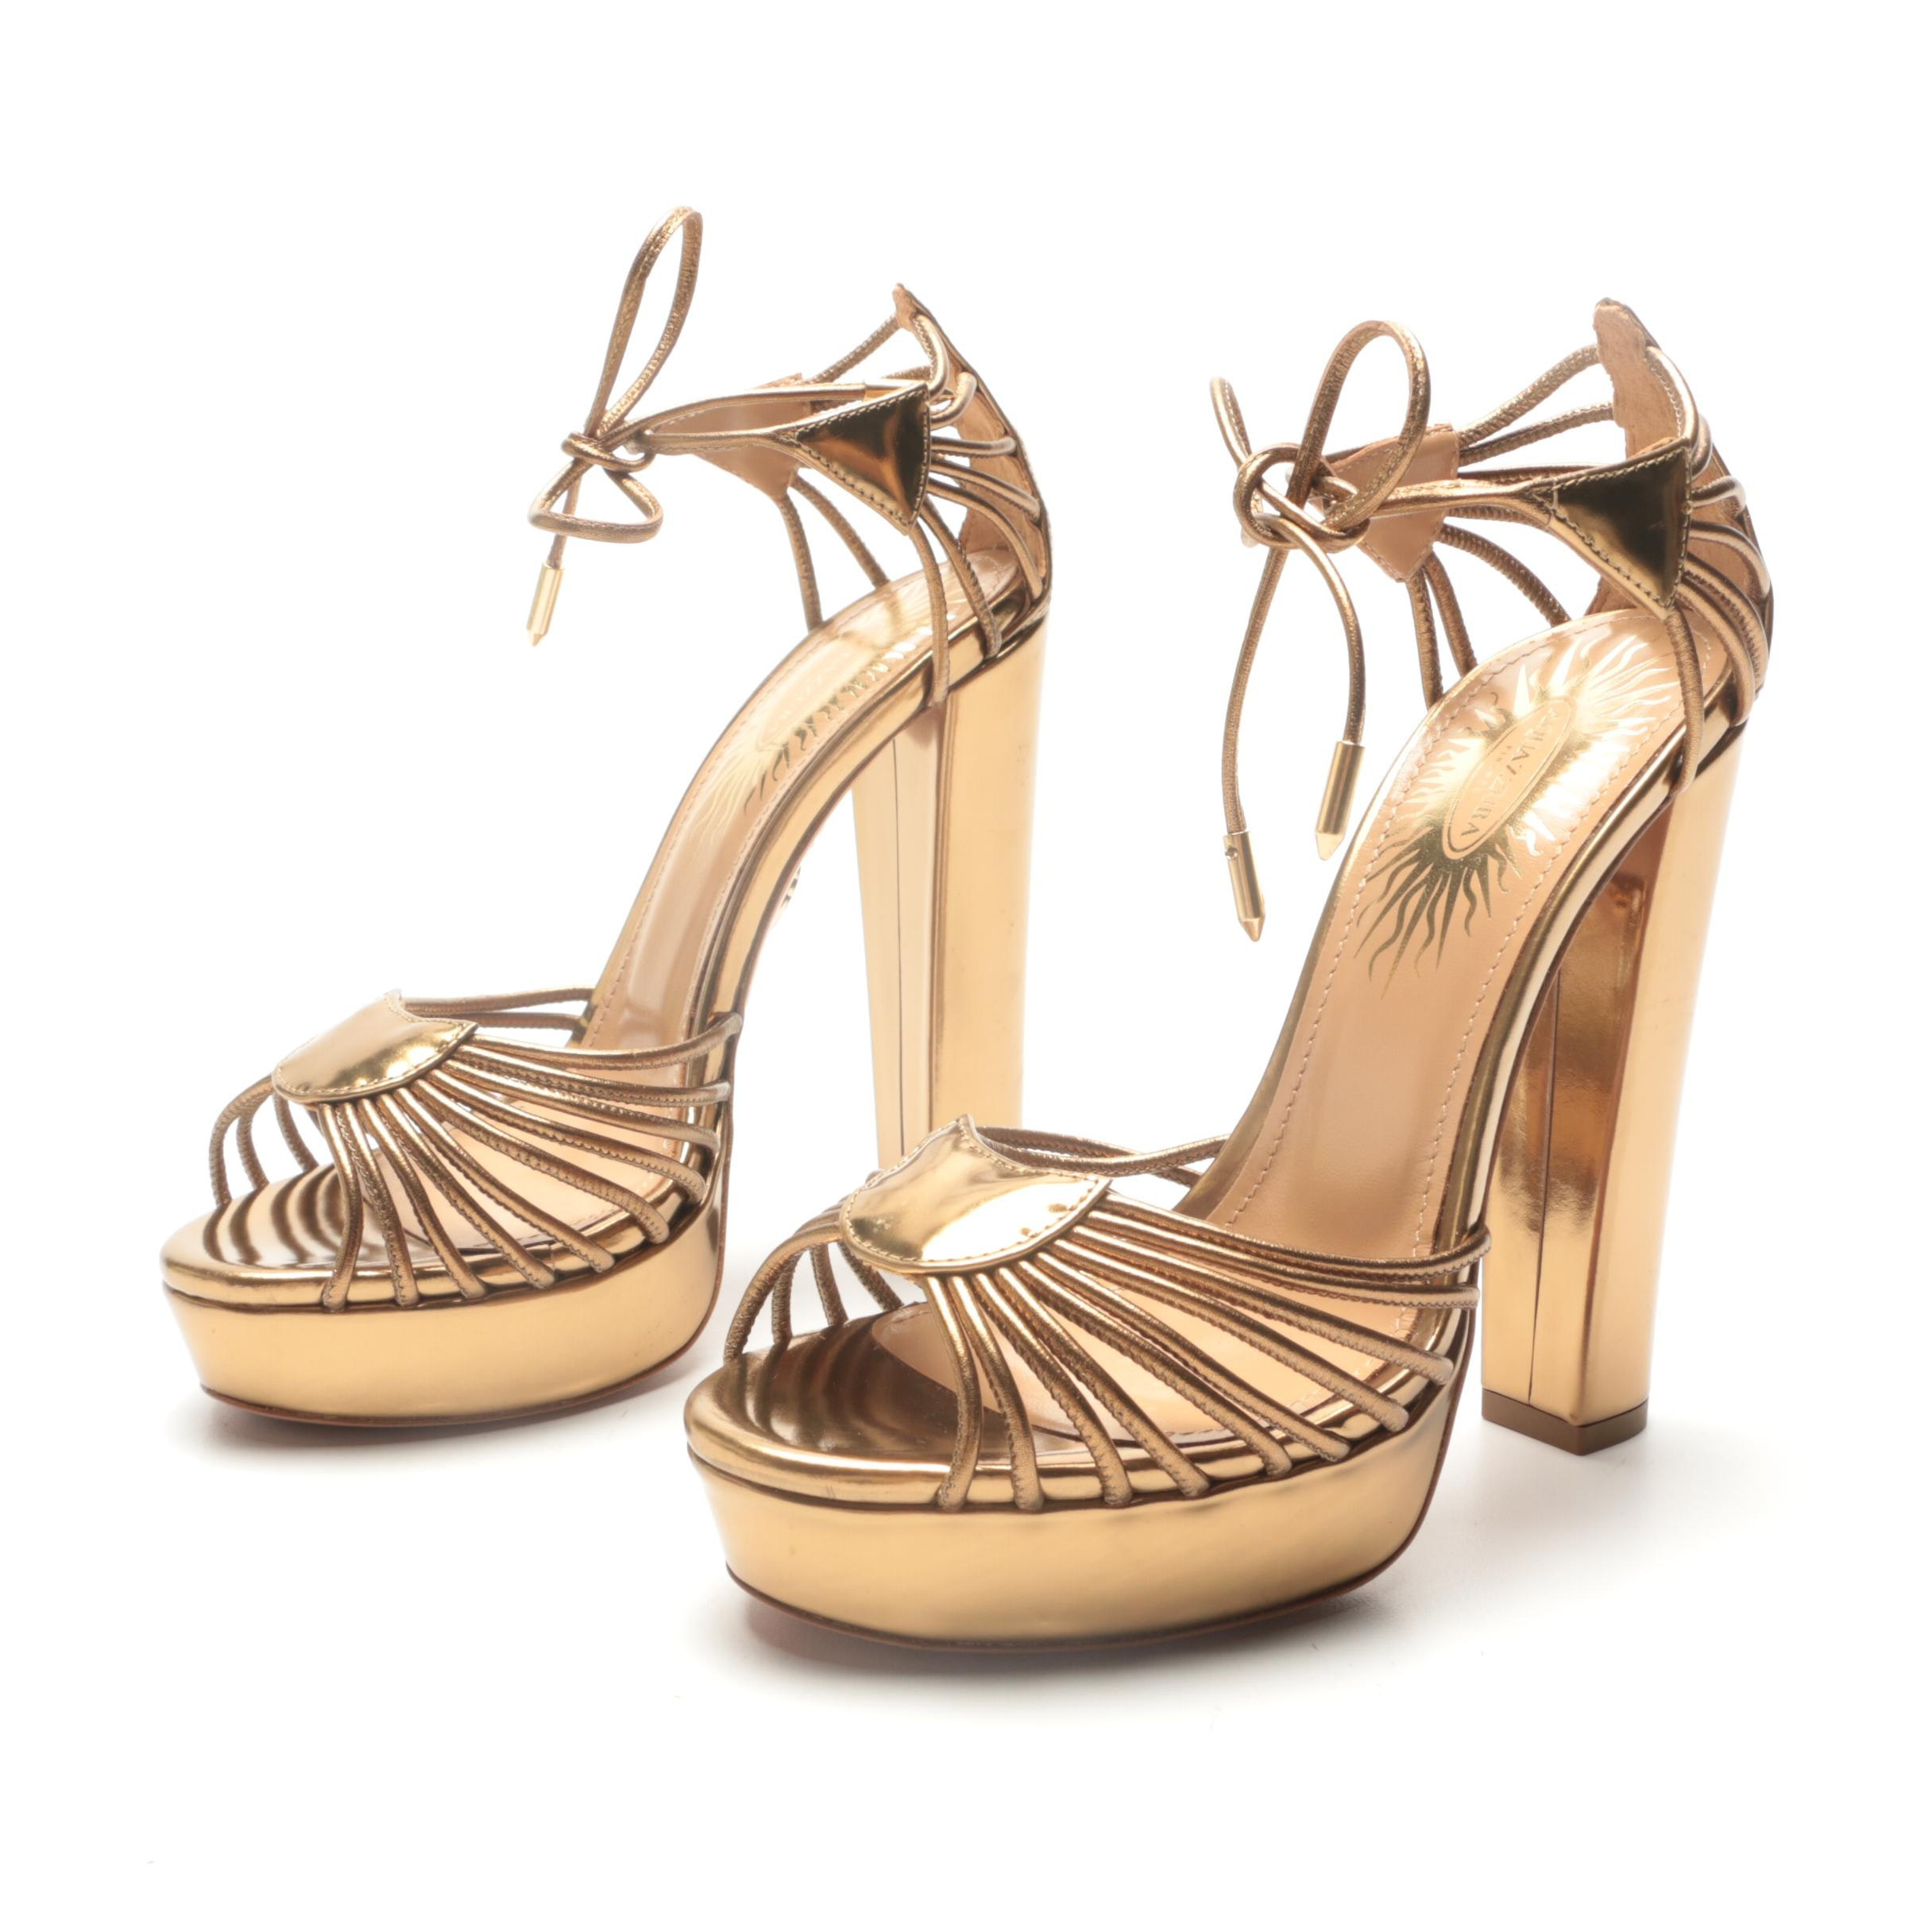 Aquazzura Josephine Plateau 130 Platform High-Heeled Sandals in Antique Gold